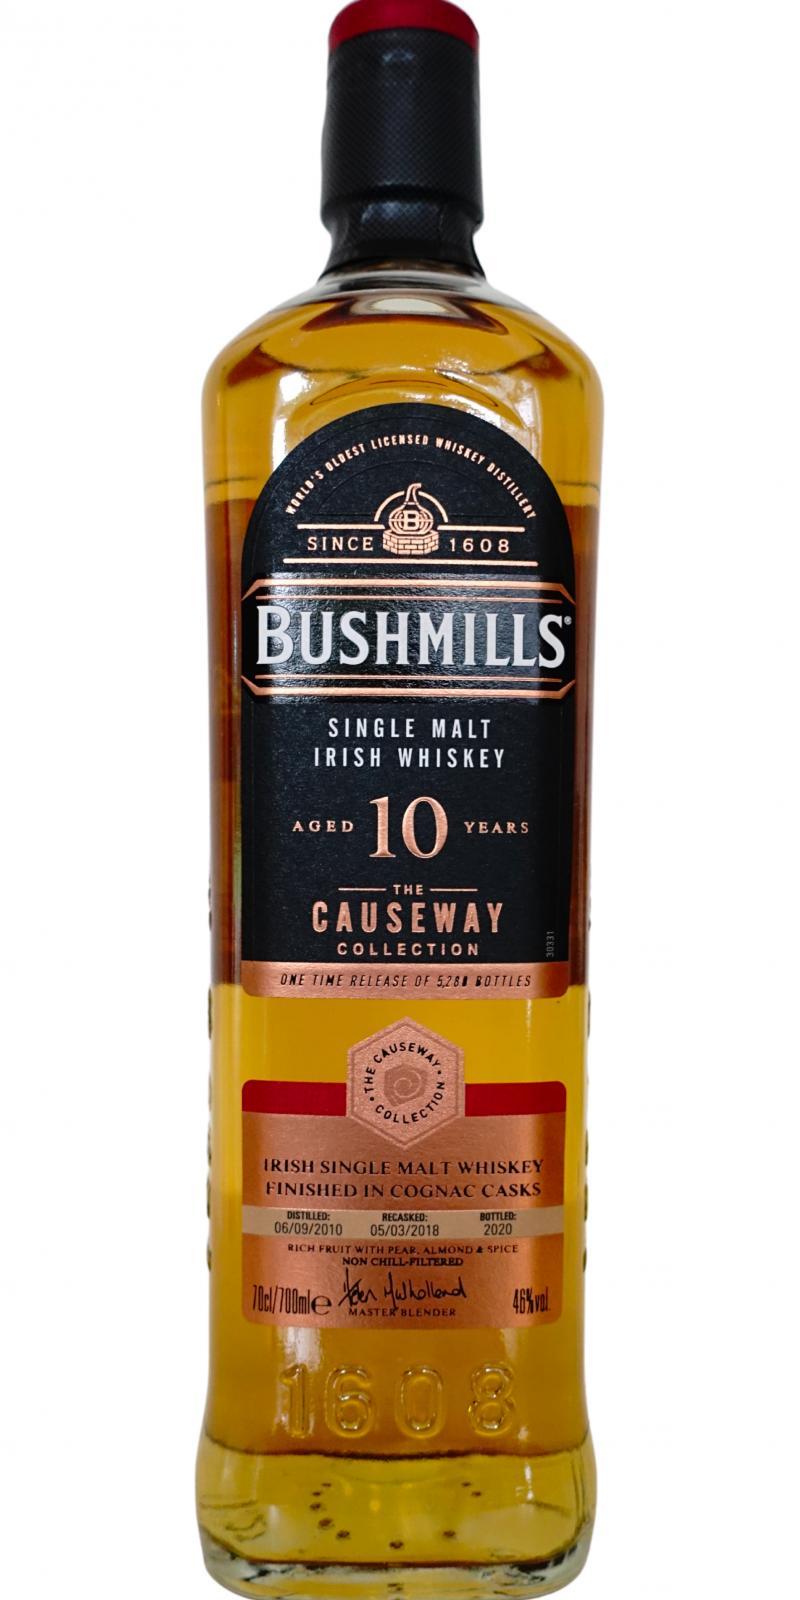 Bushmills 2010